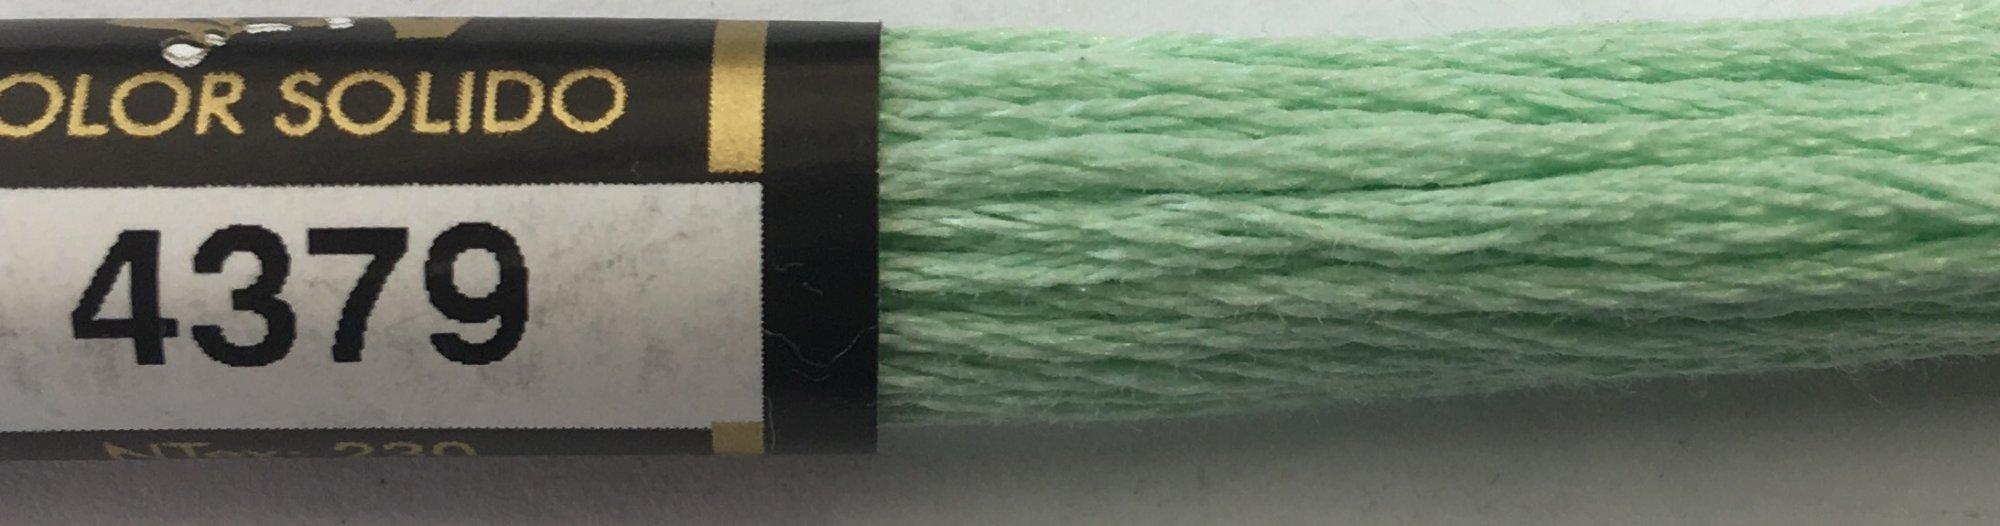 F4379 Presencia 100% Mercerized Finca Cotton 6 ply Embroidery Floss 8 meter skein